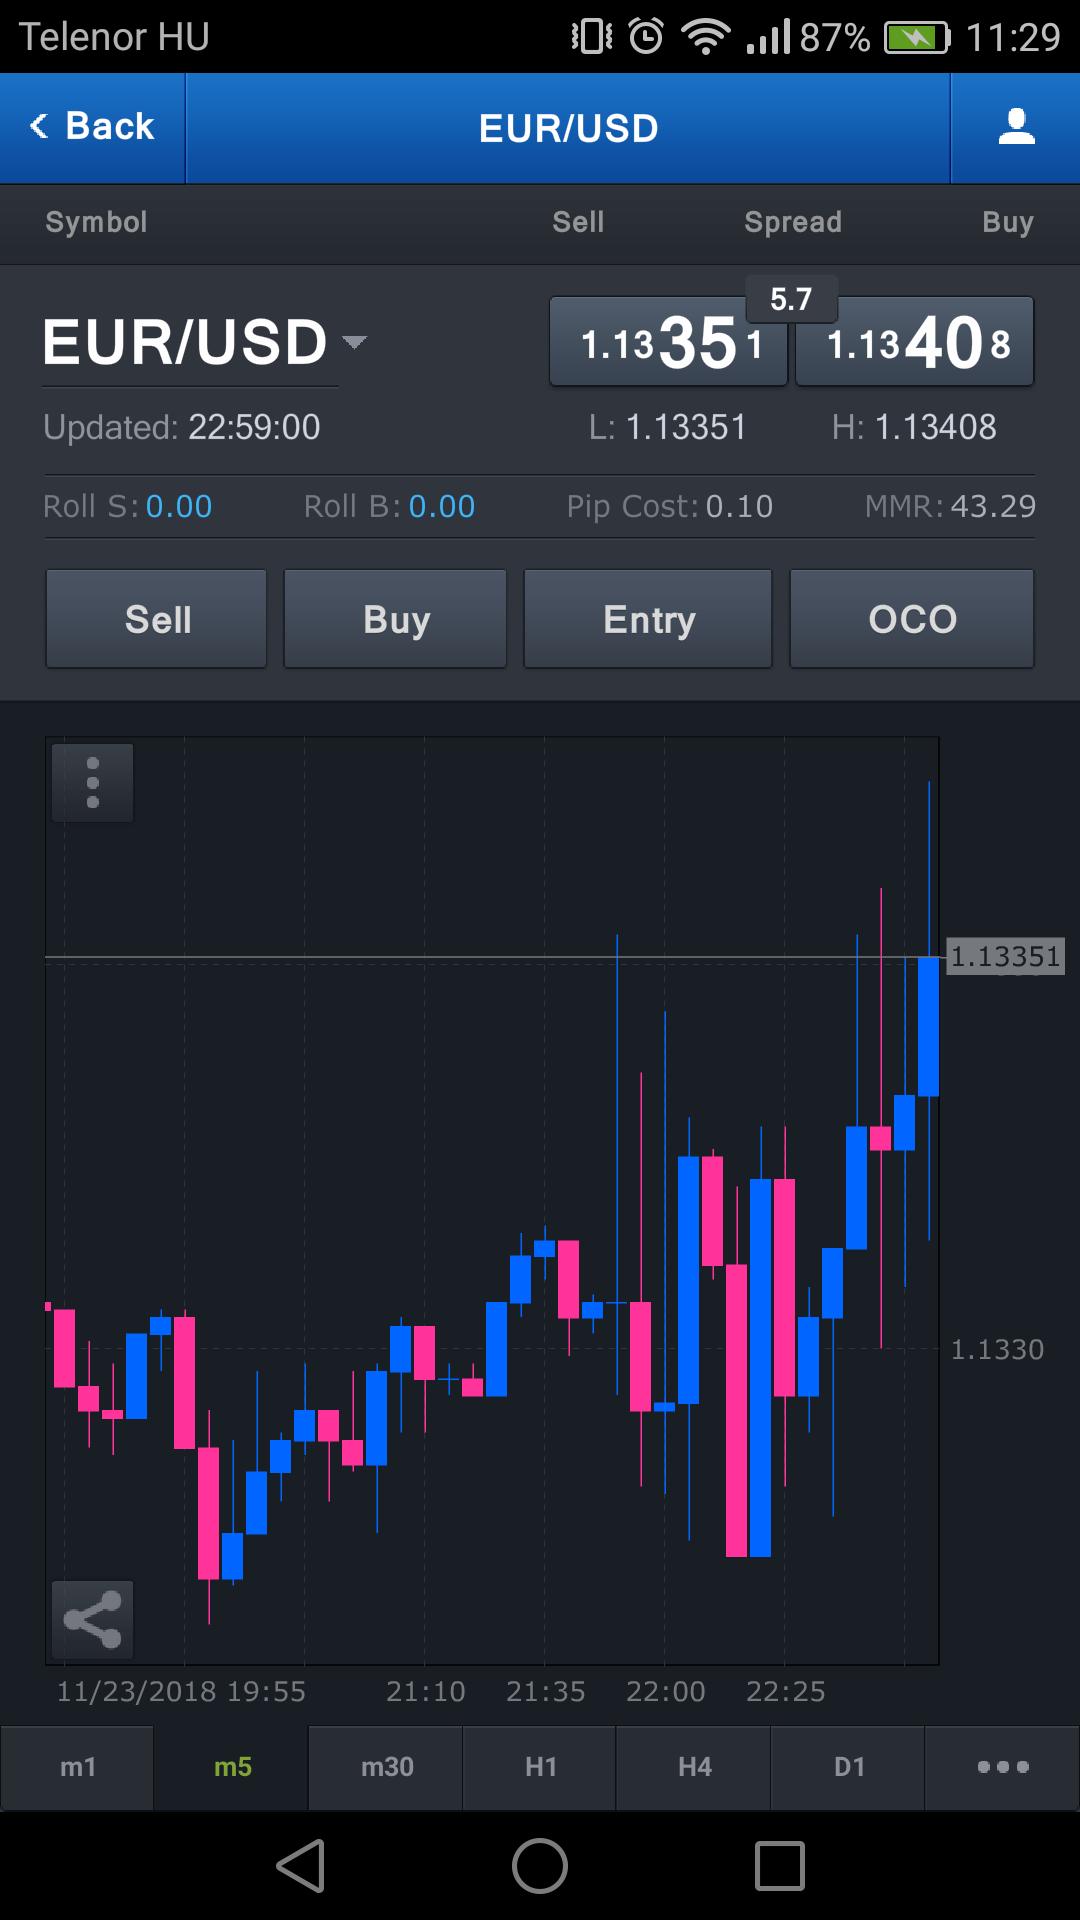 FXCM review - Mobile trading platform - Order panel